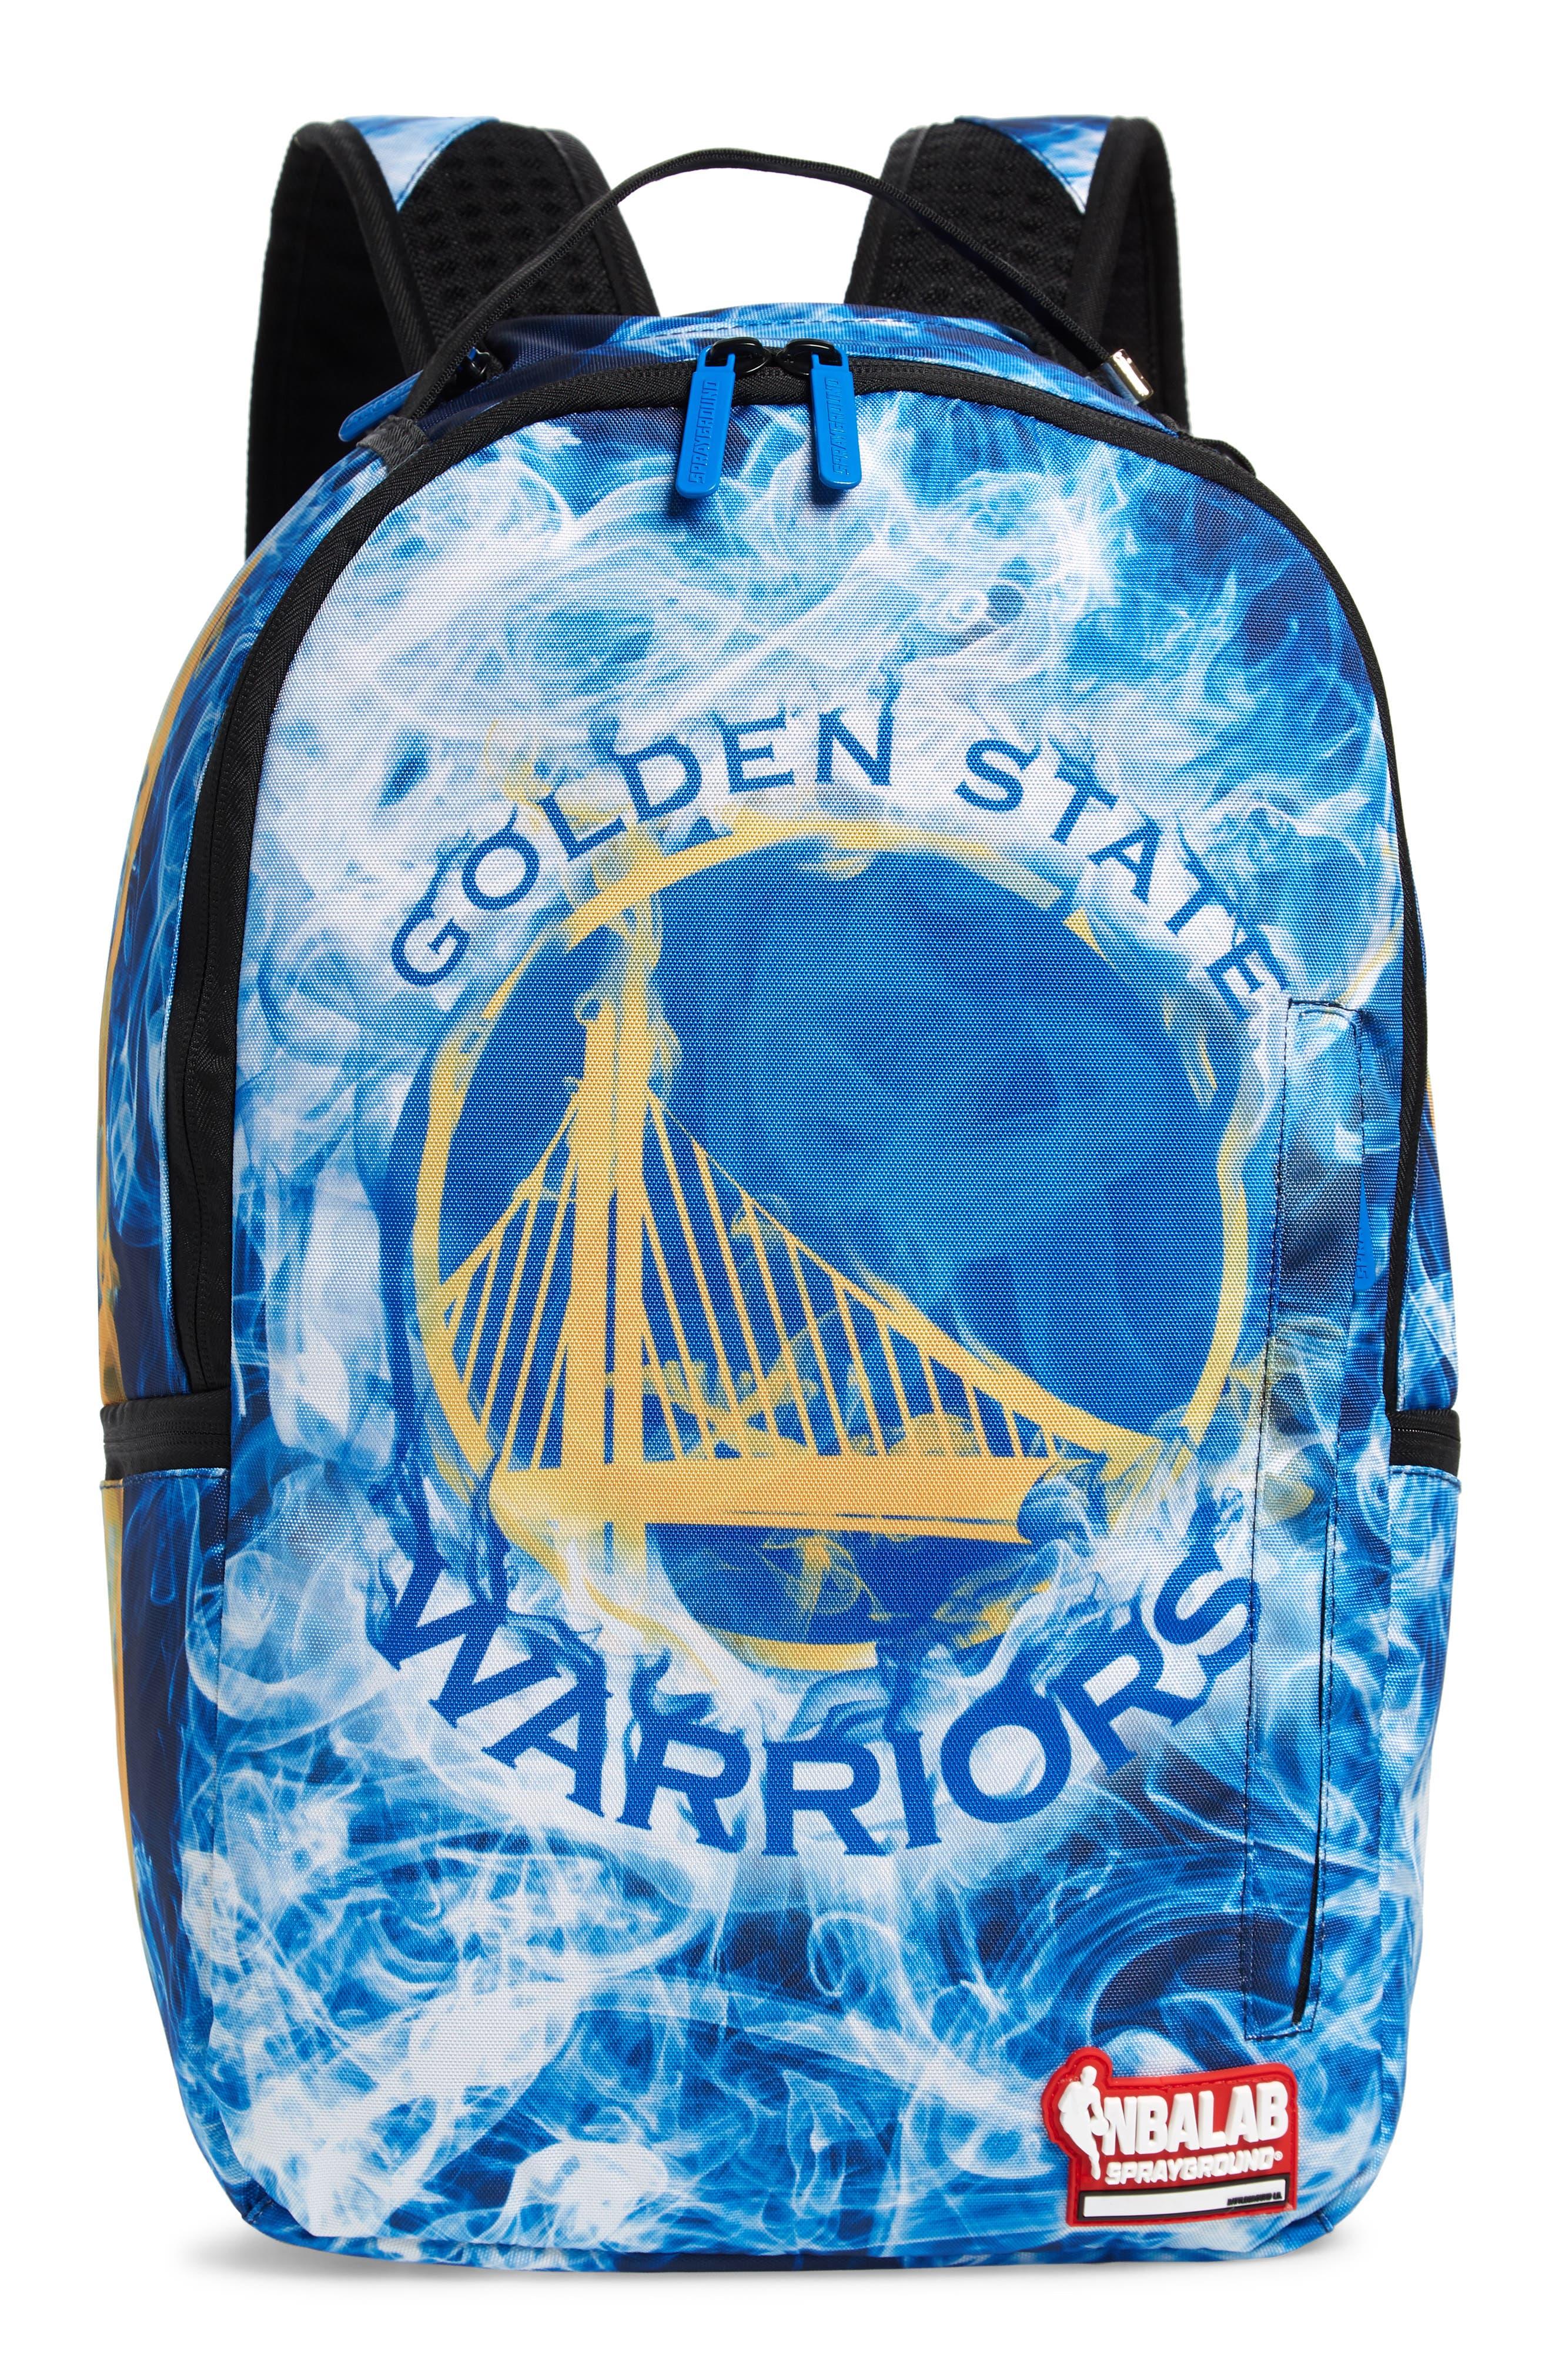 Golden State Smoke Backpack,                         Main,                         color, Blue